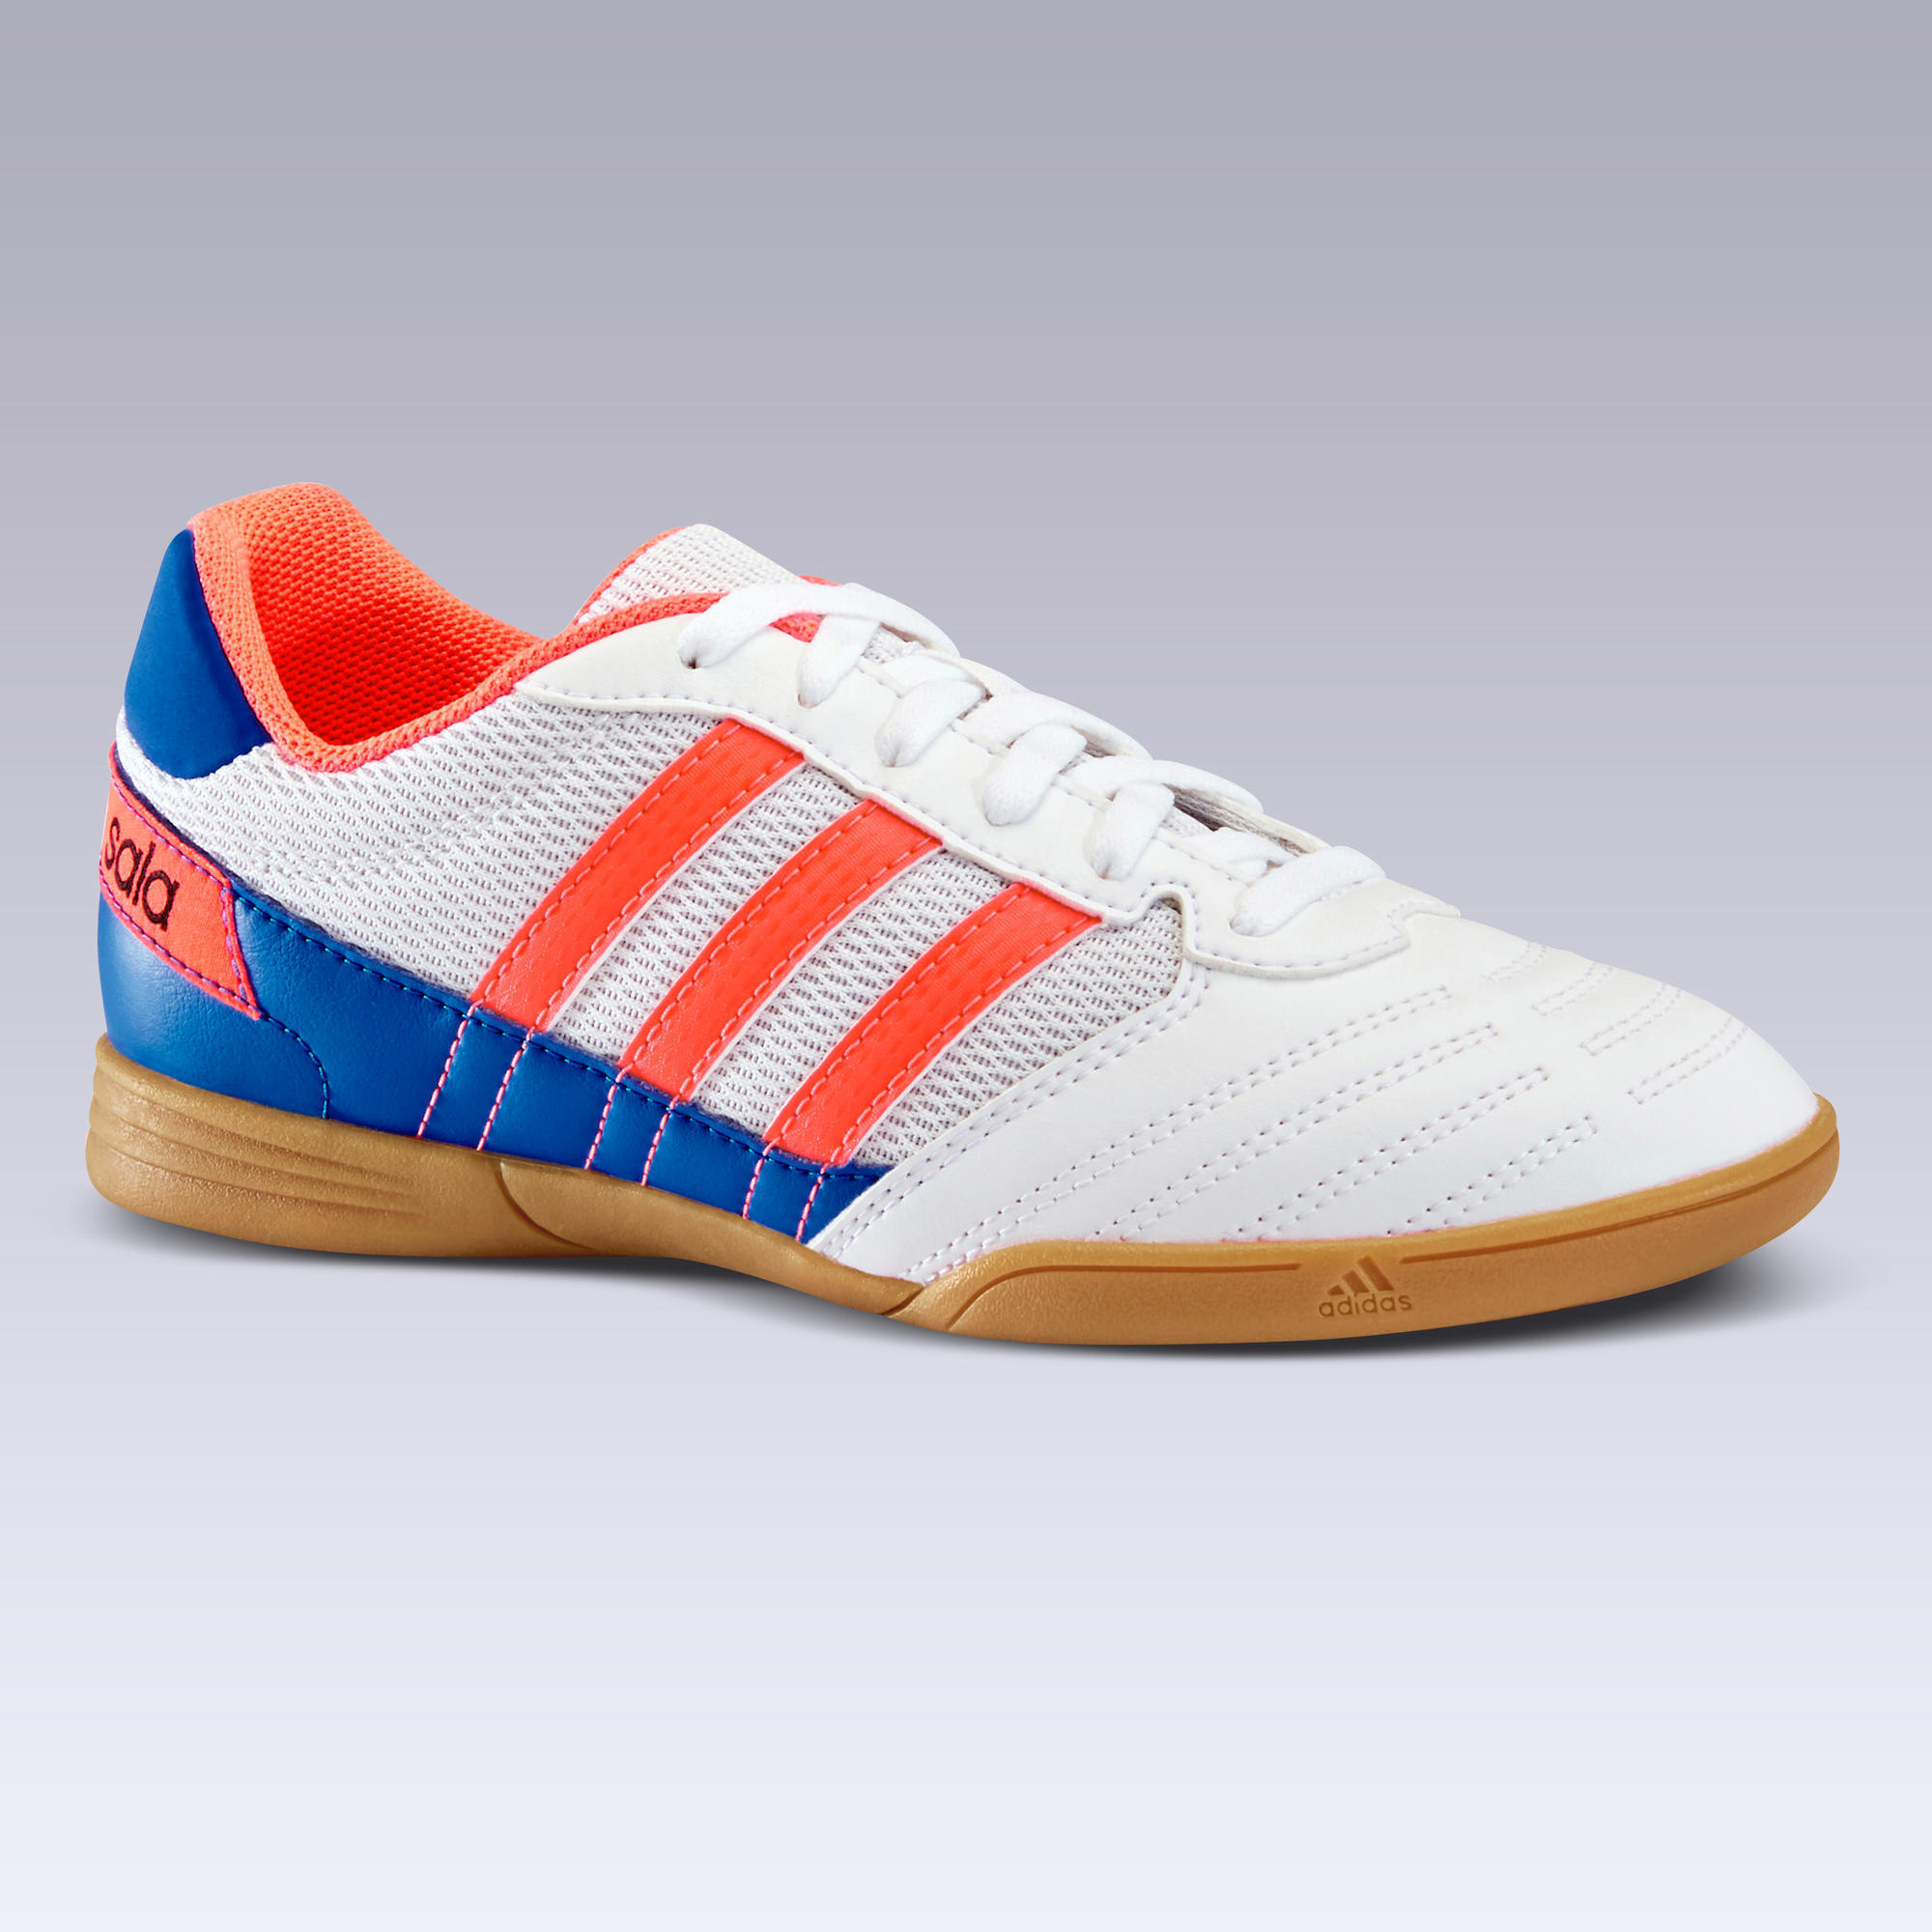 Chaussure de Futsal enfant SUPER SALA Blanche ADIDAS | Decathlon